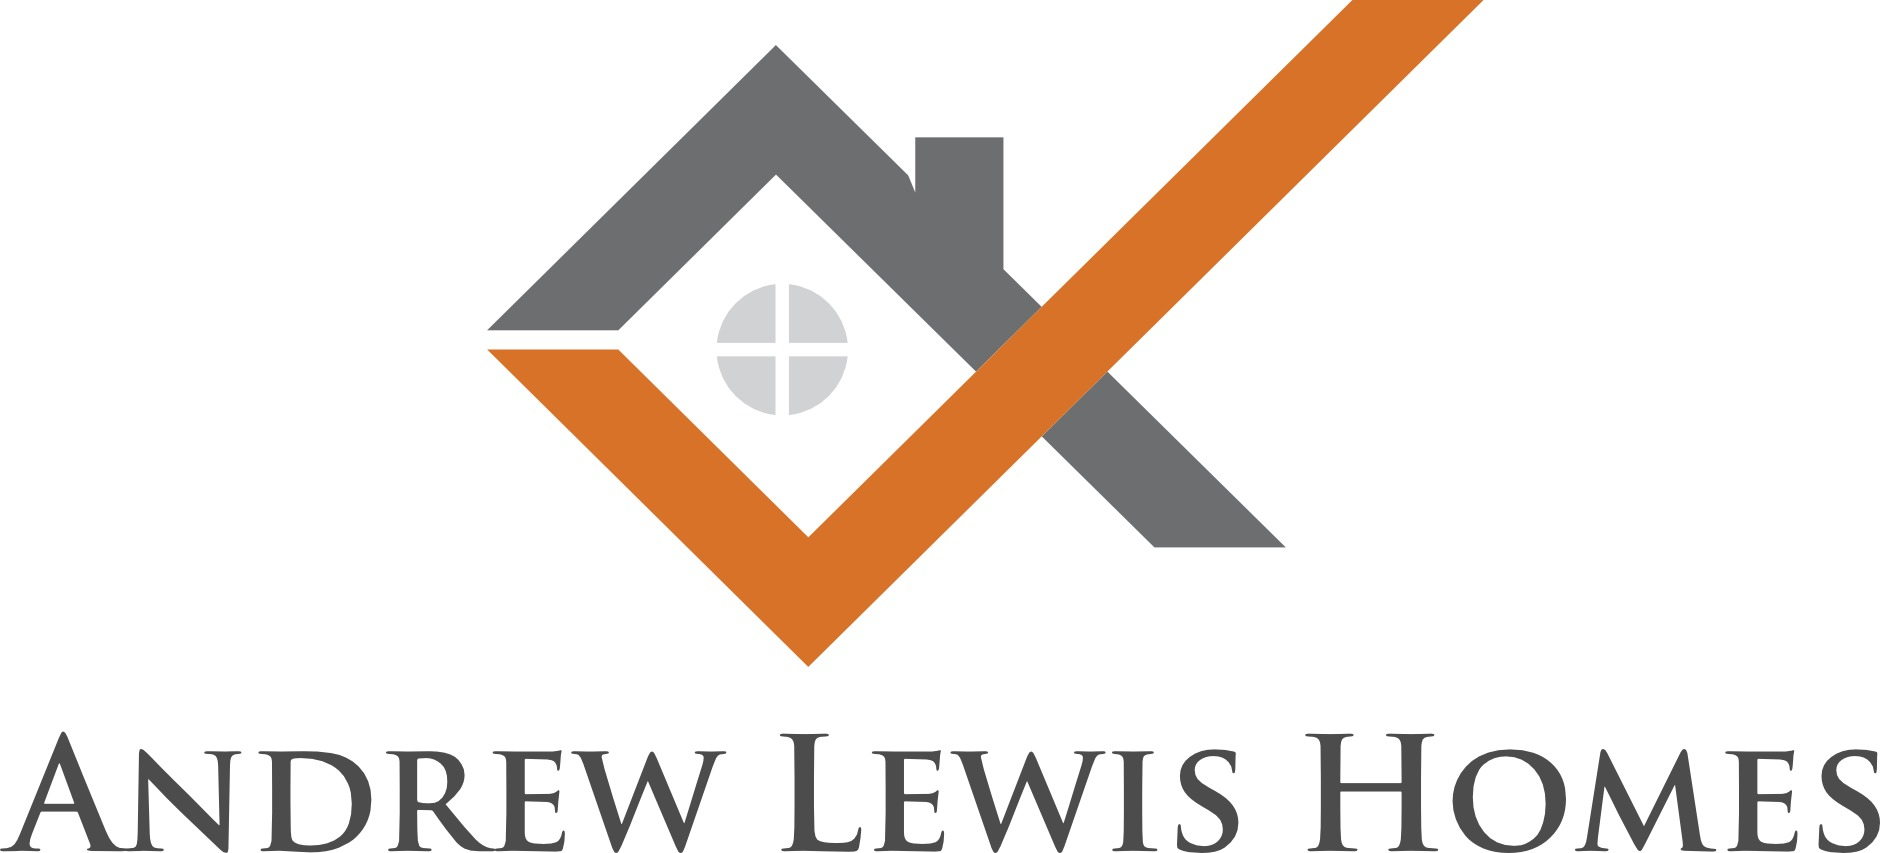 Andrew Lewis Homes logo